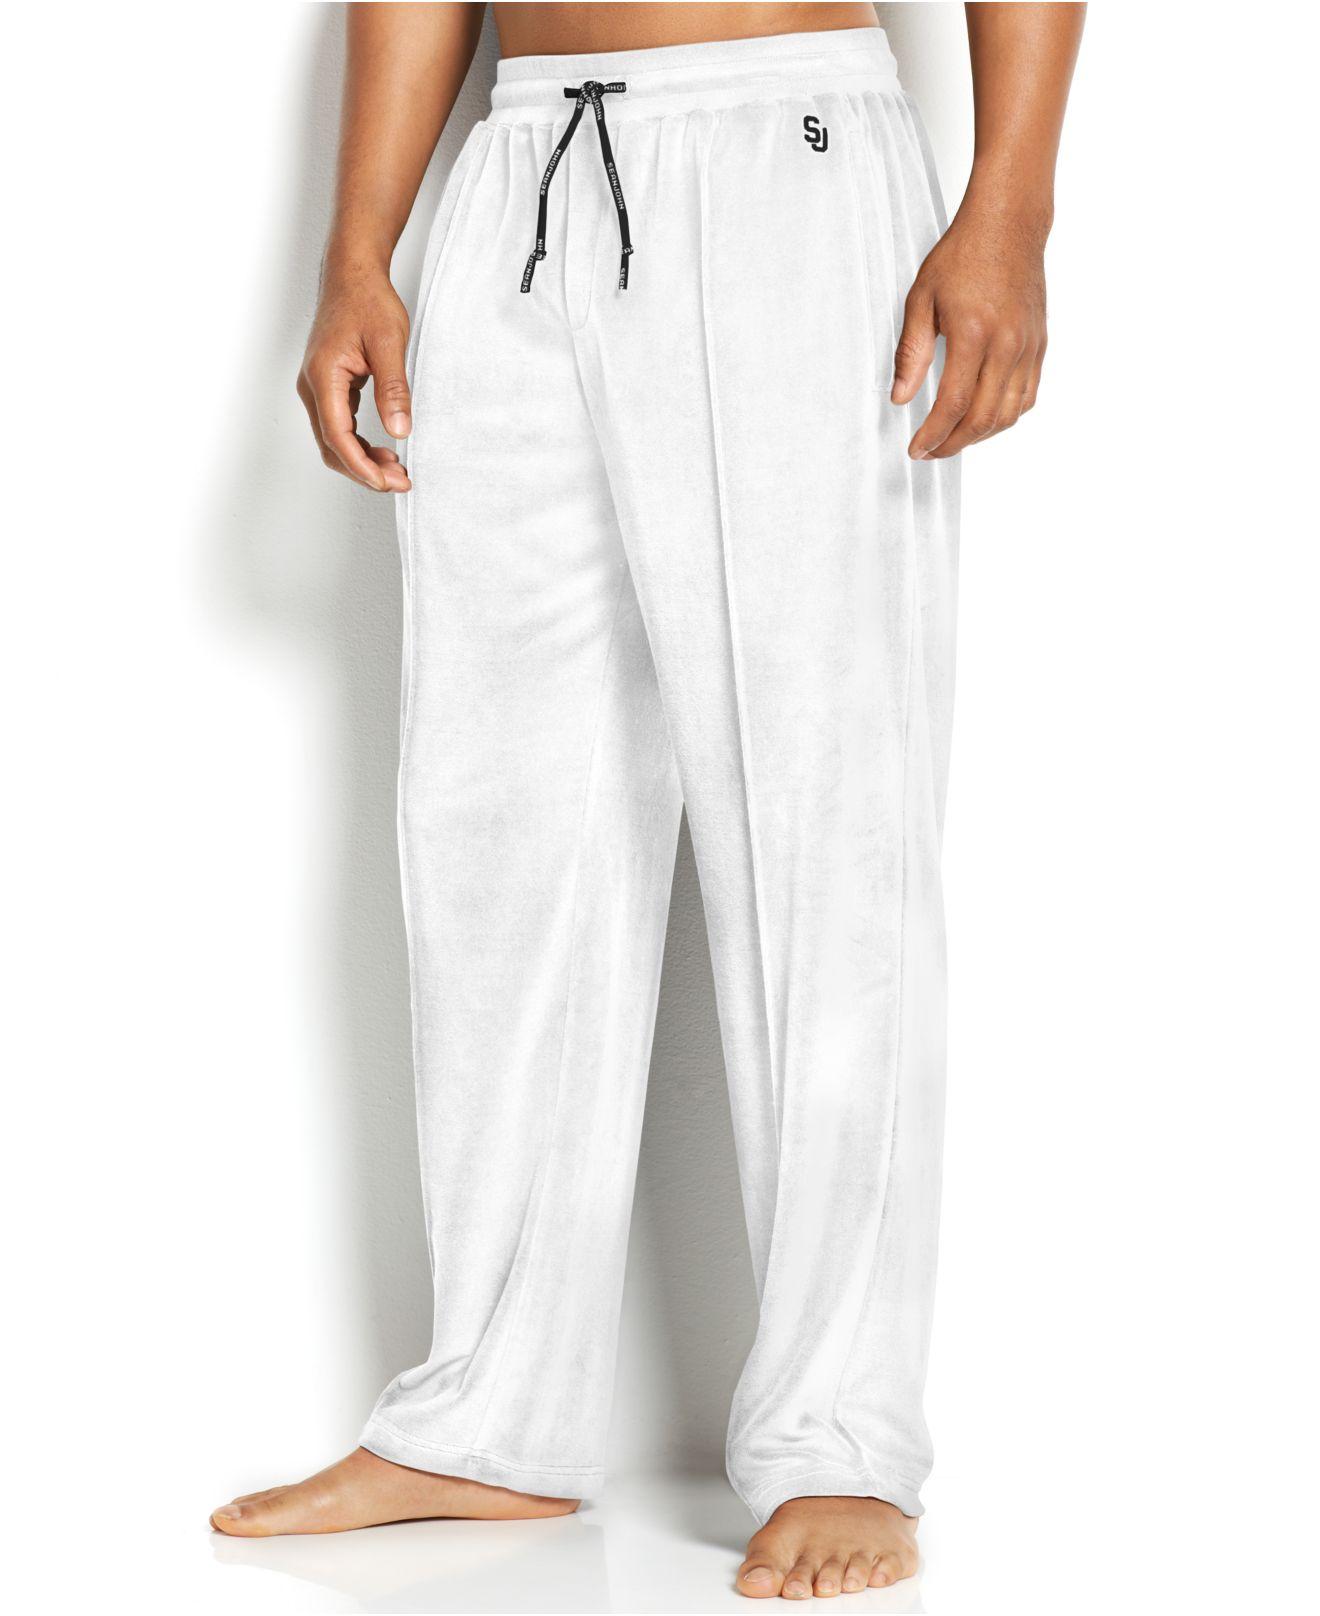 White Velour Pants | Gpant